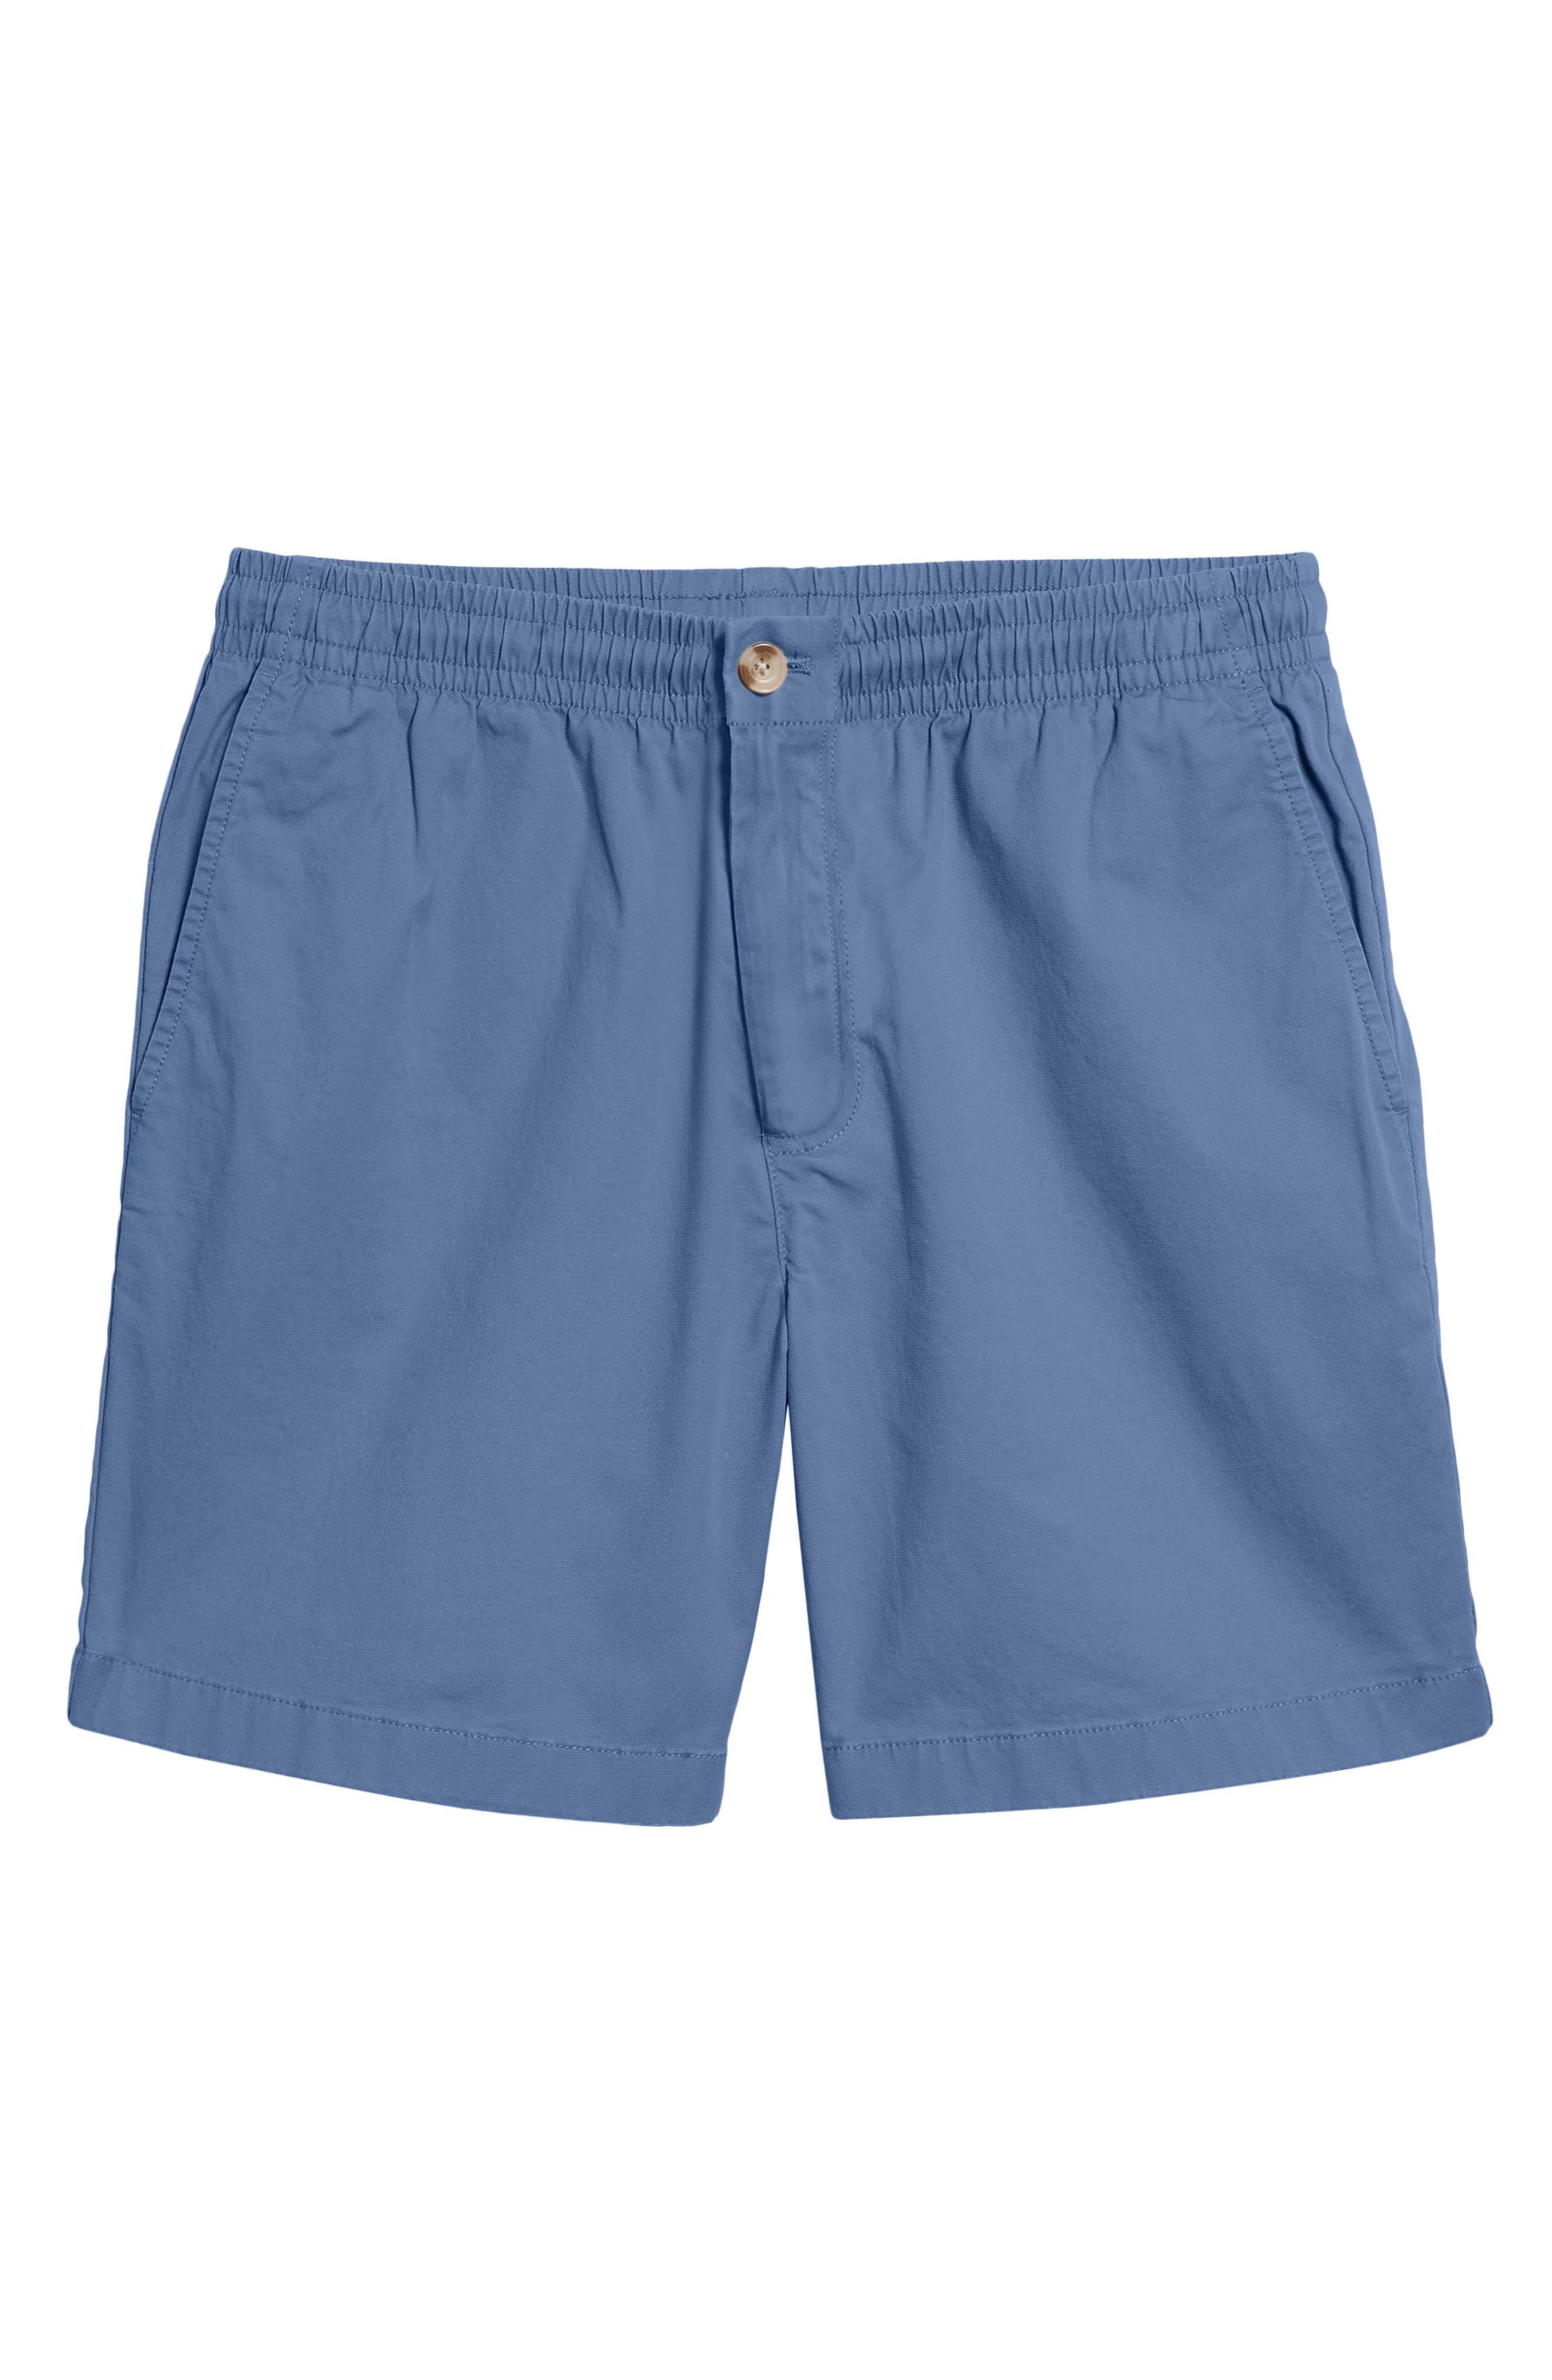 Jetty Stretch Cotton Shorts,                             Alternate thumbnail 6, color,                             Moonshine